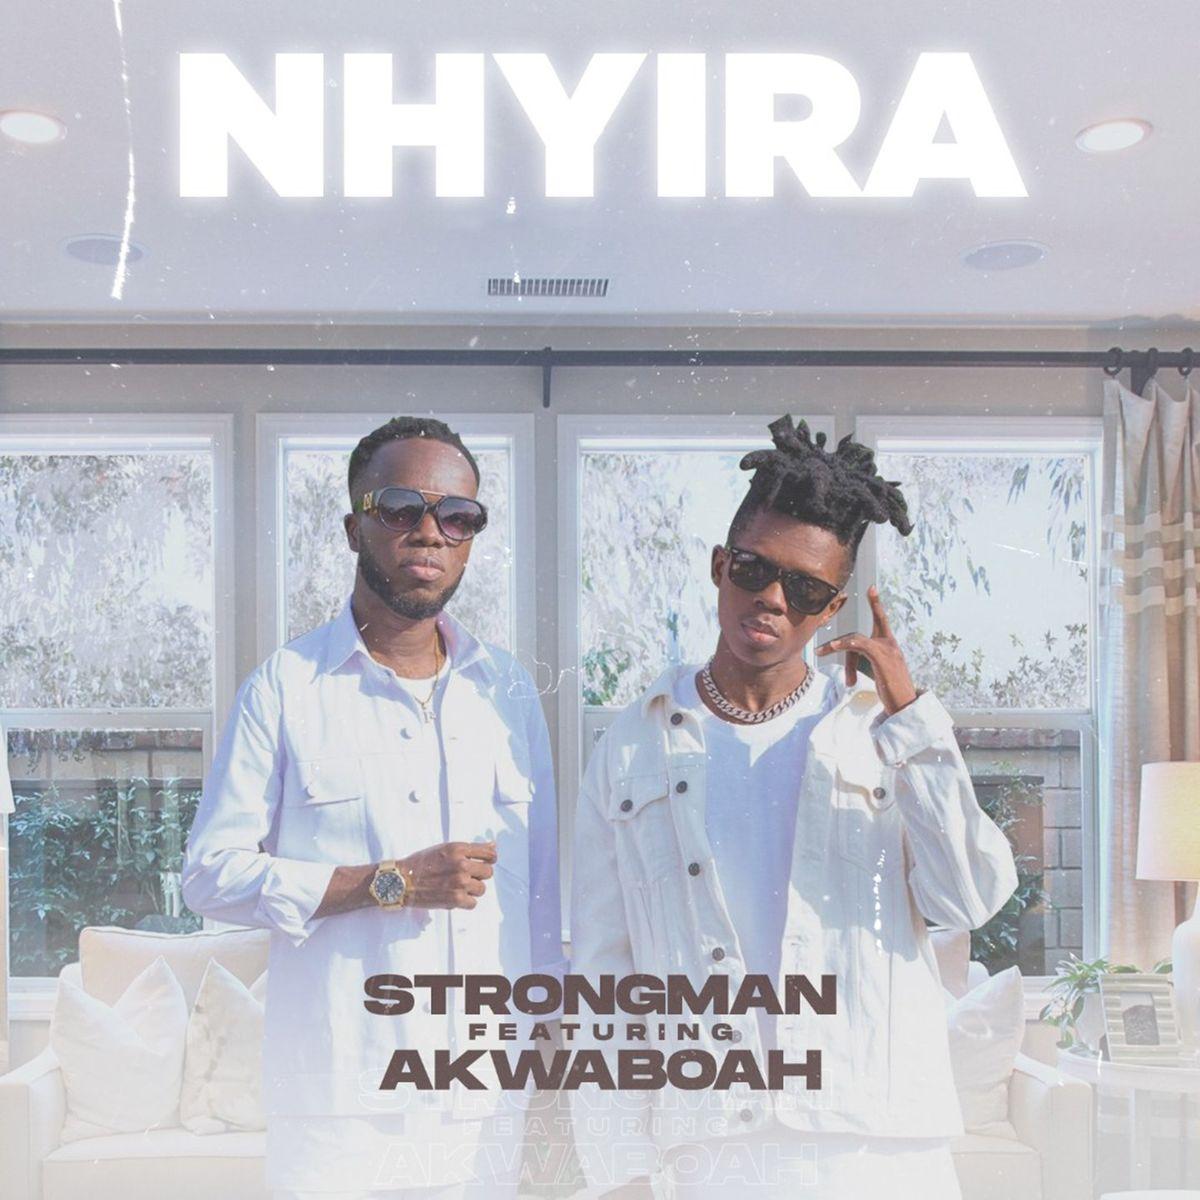 Strongman - Nhyira Ft. Akwaboah (Official Video)